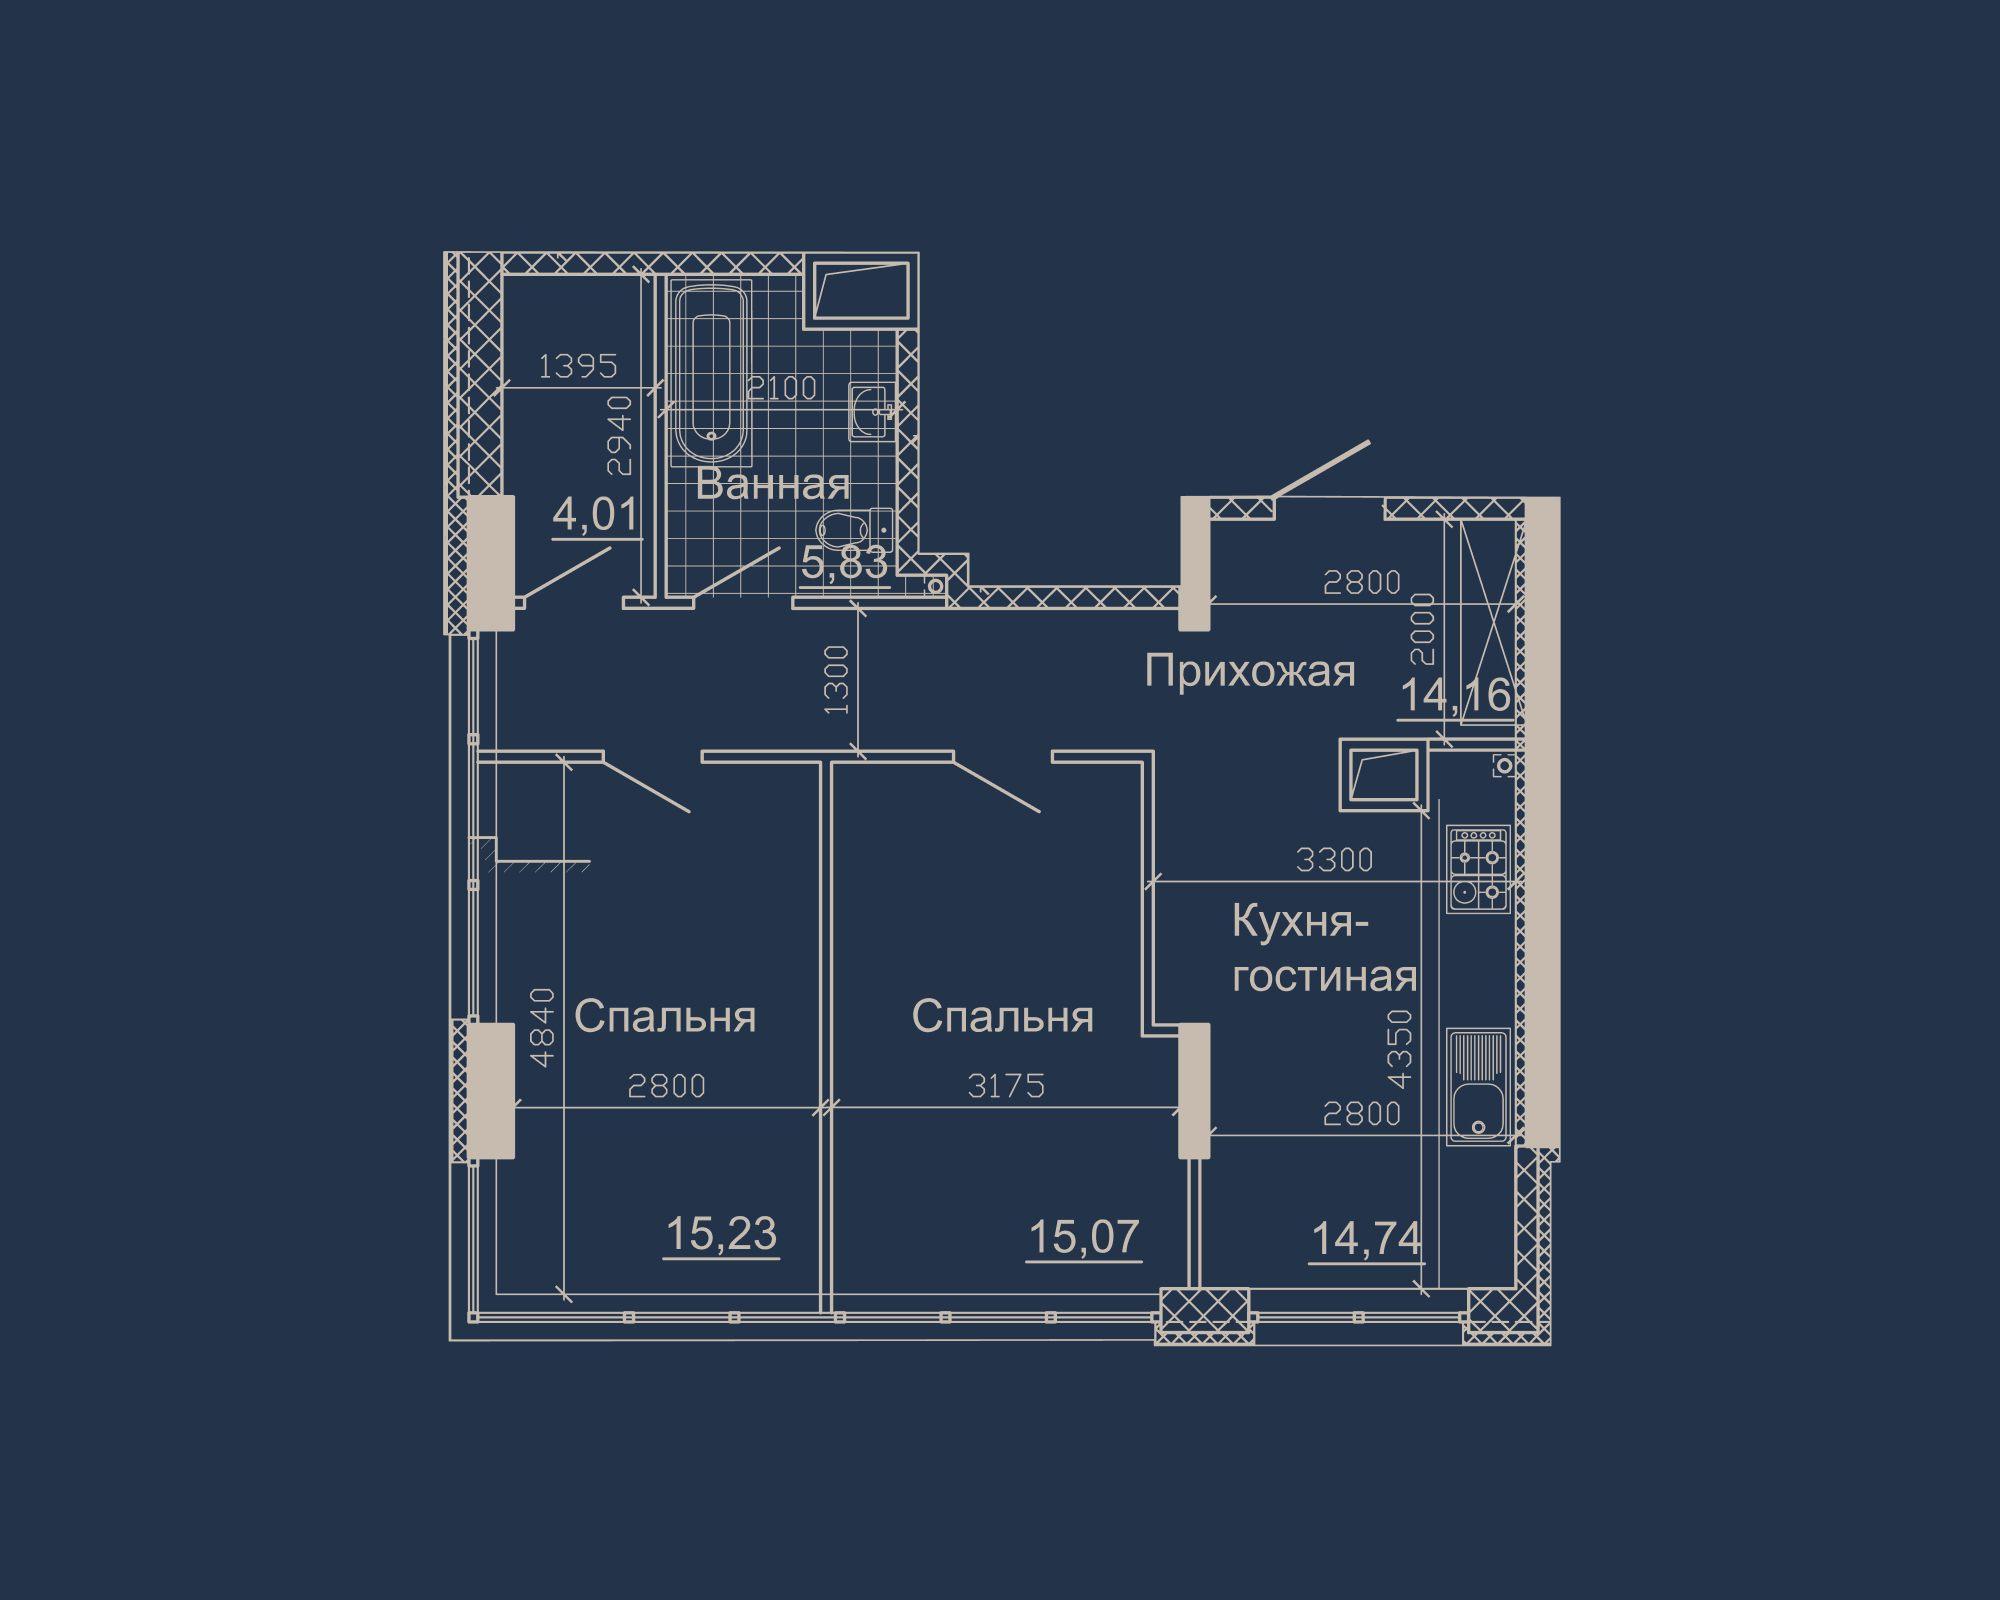 2-кімнатна квартира типу 12А у ЖК Nebo